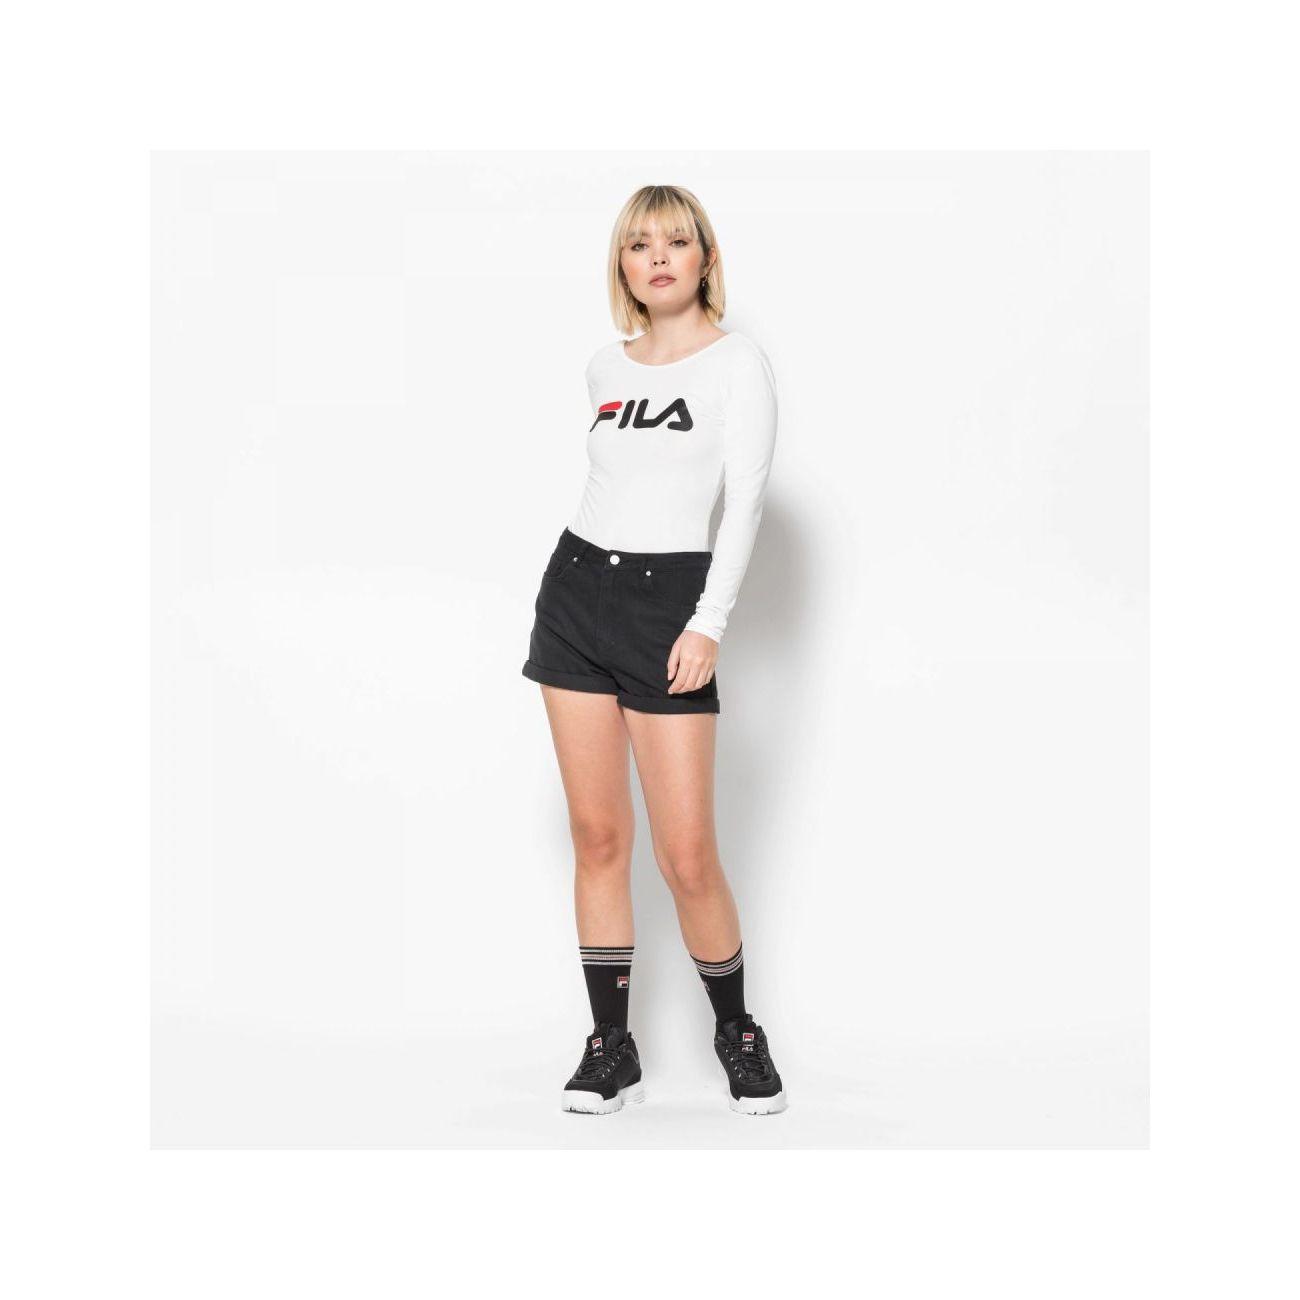 Mode- Lifestyle femme FILA Body Yulia